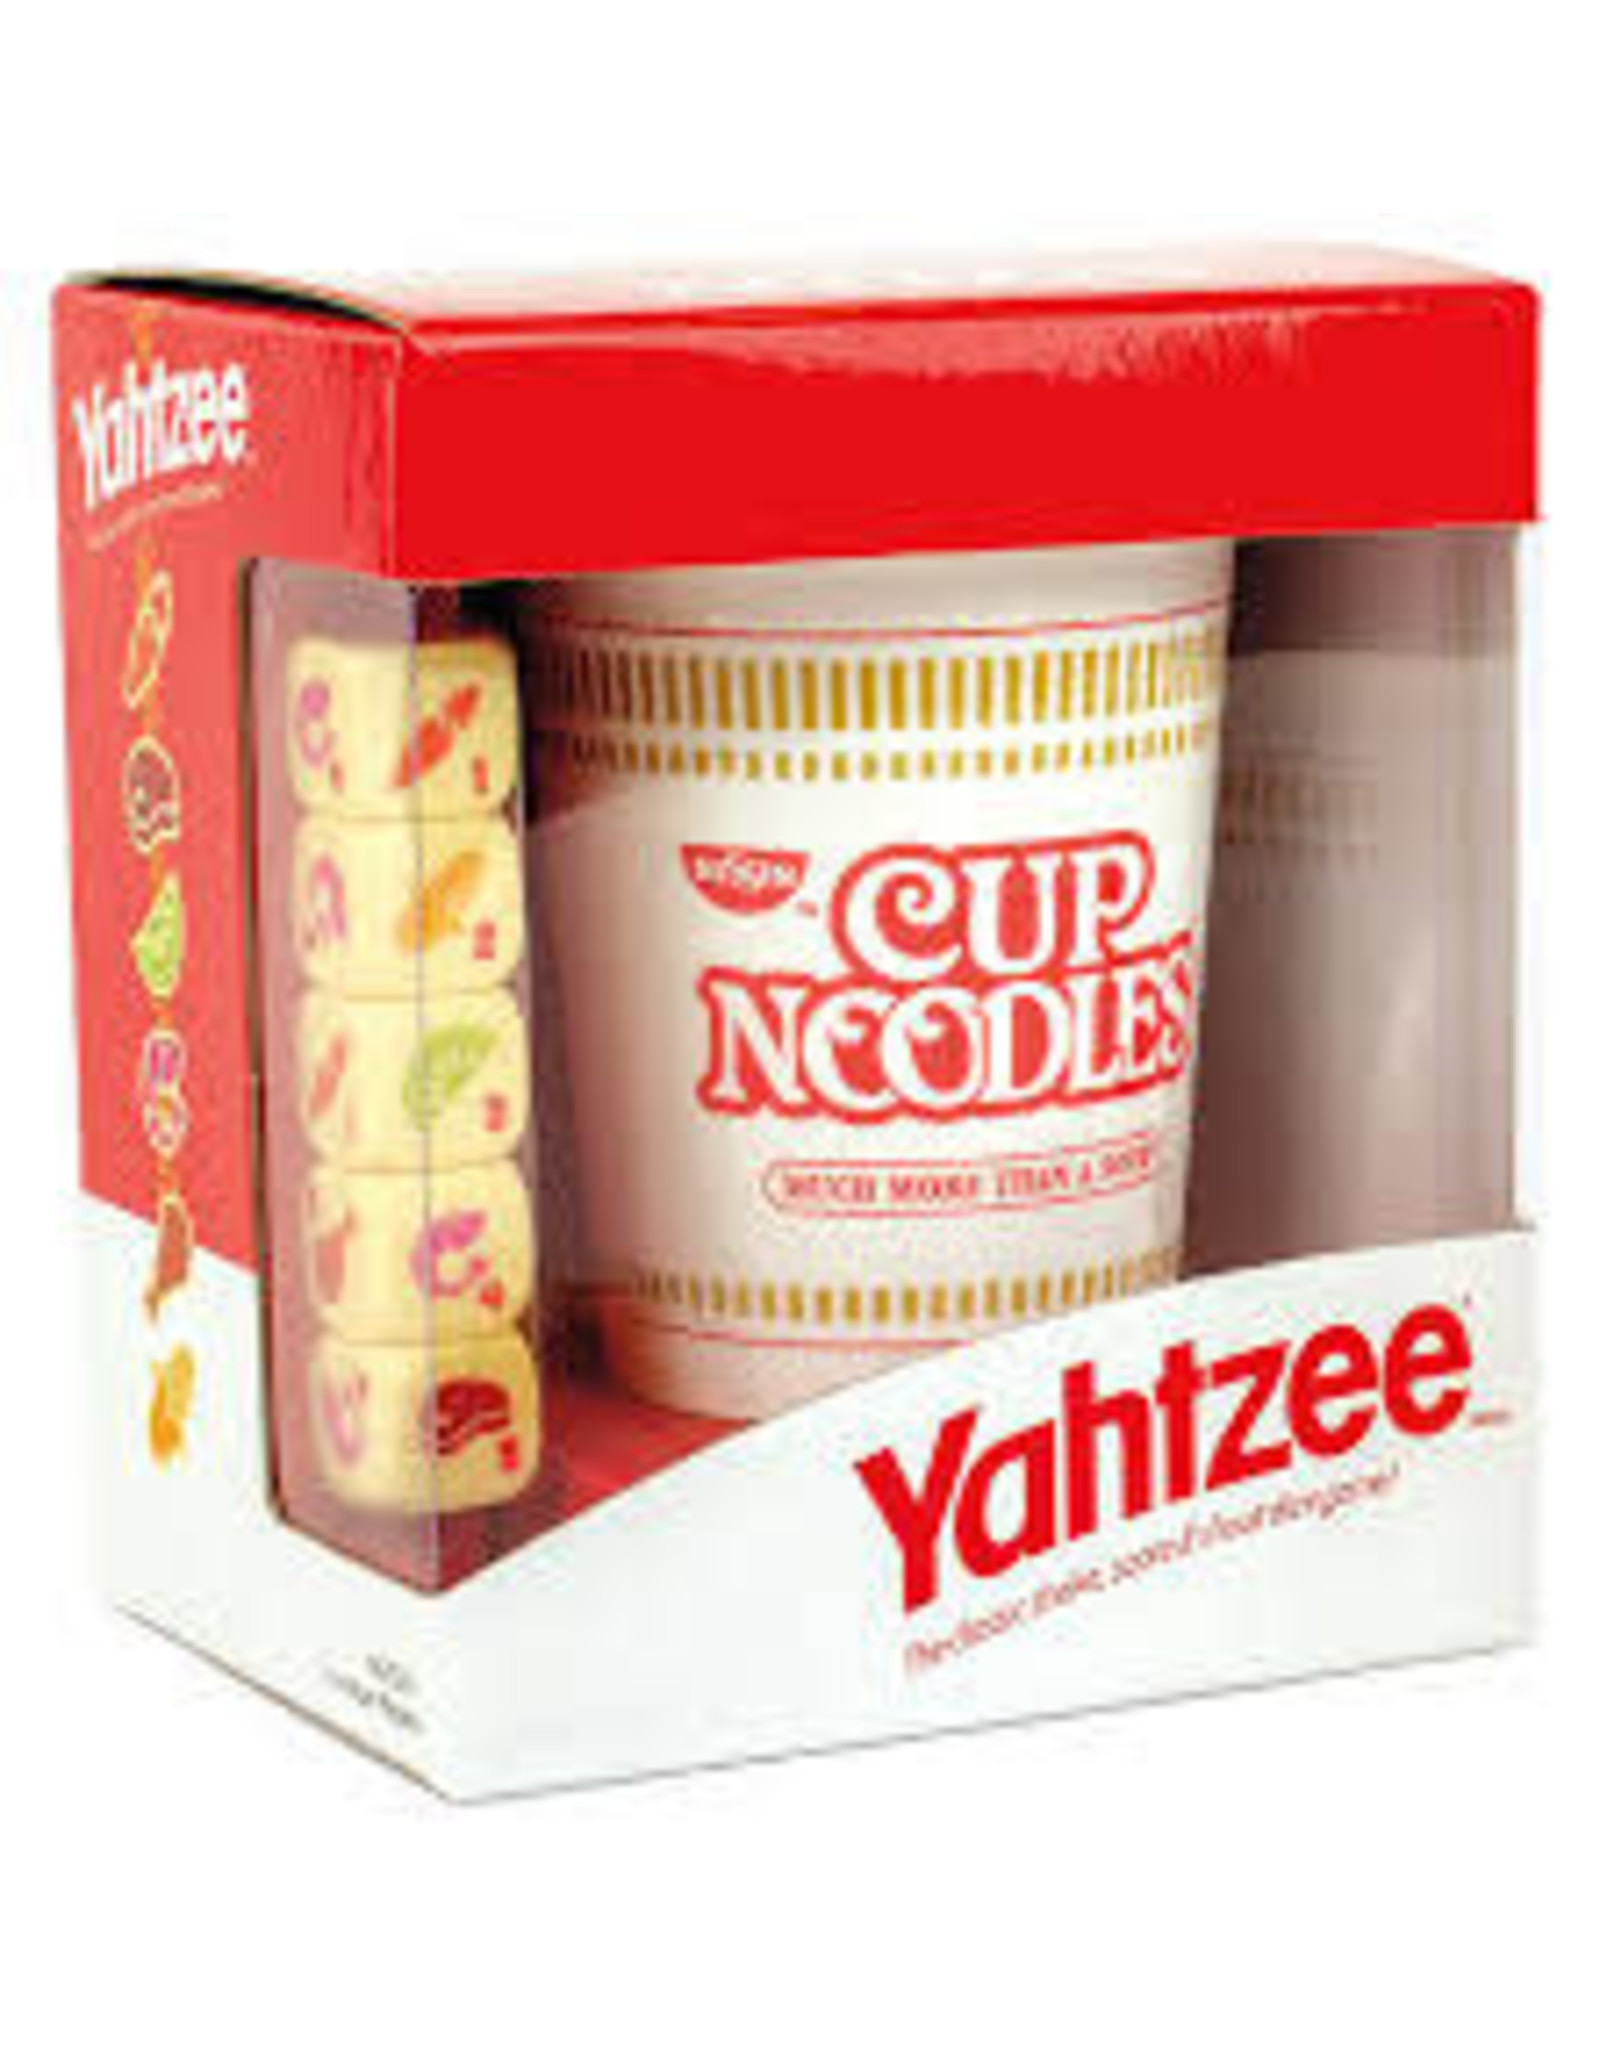 The OP Yahtzee: Cup of Noodles